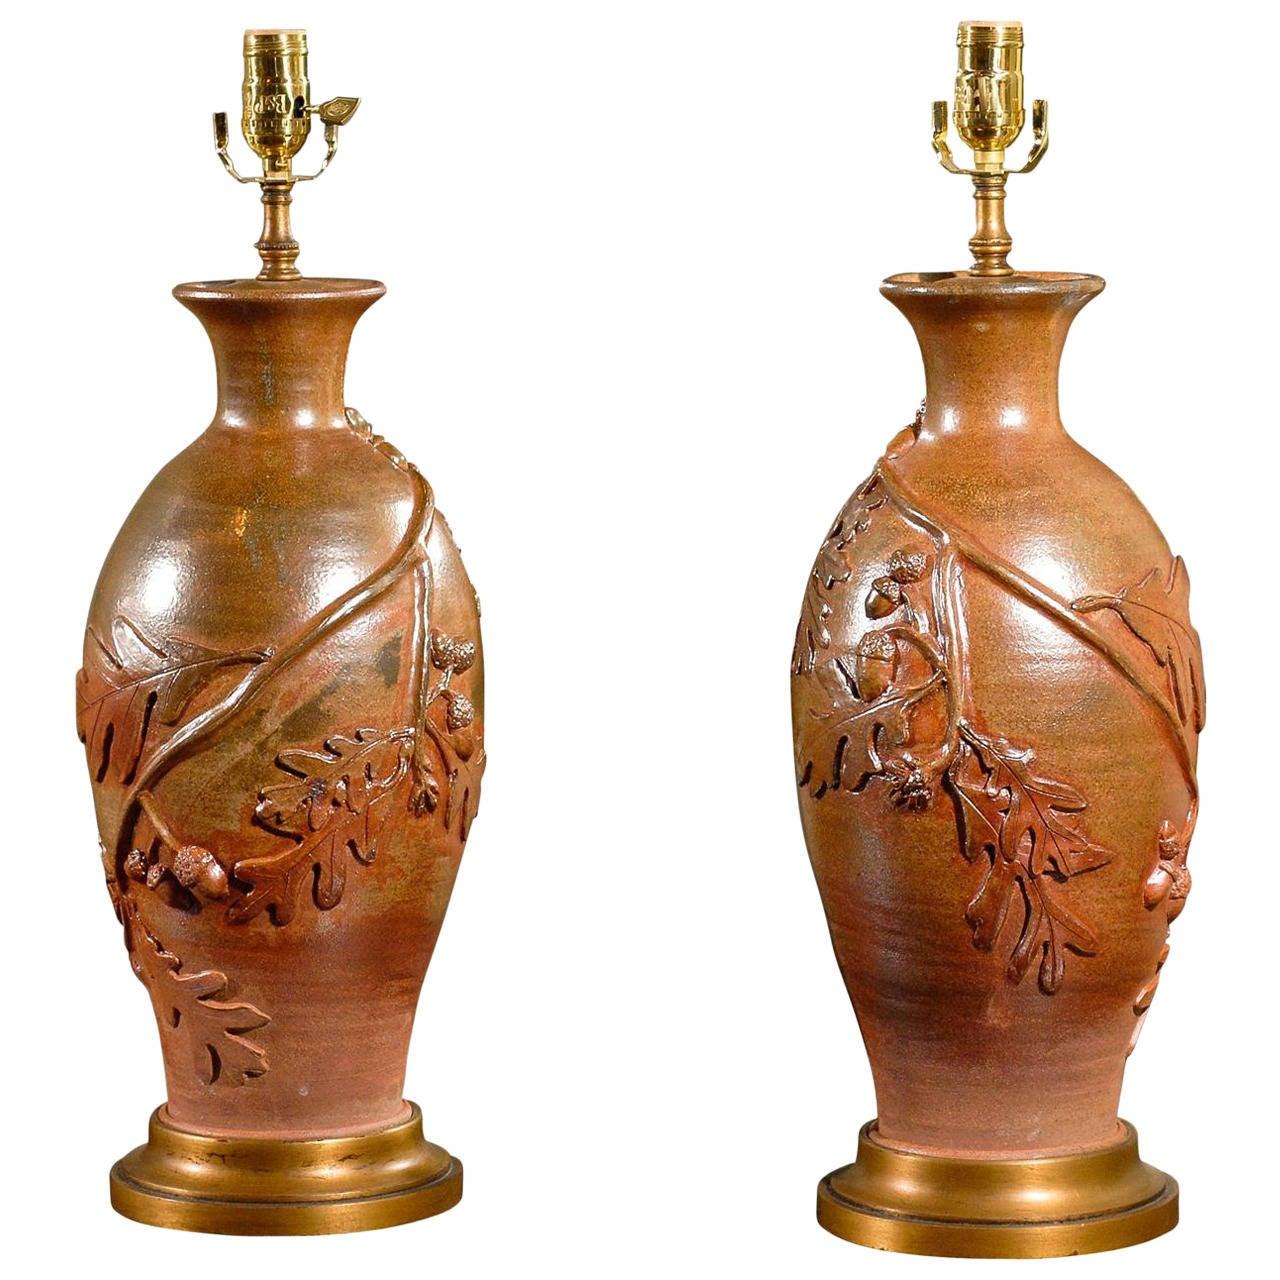 Modern Ceramic Vase Table Lamp: Pair Of Contemporary Lustre Overglazed Ceramic Table Lamps